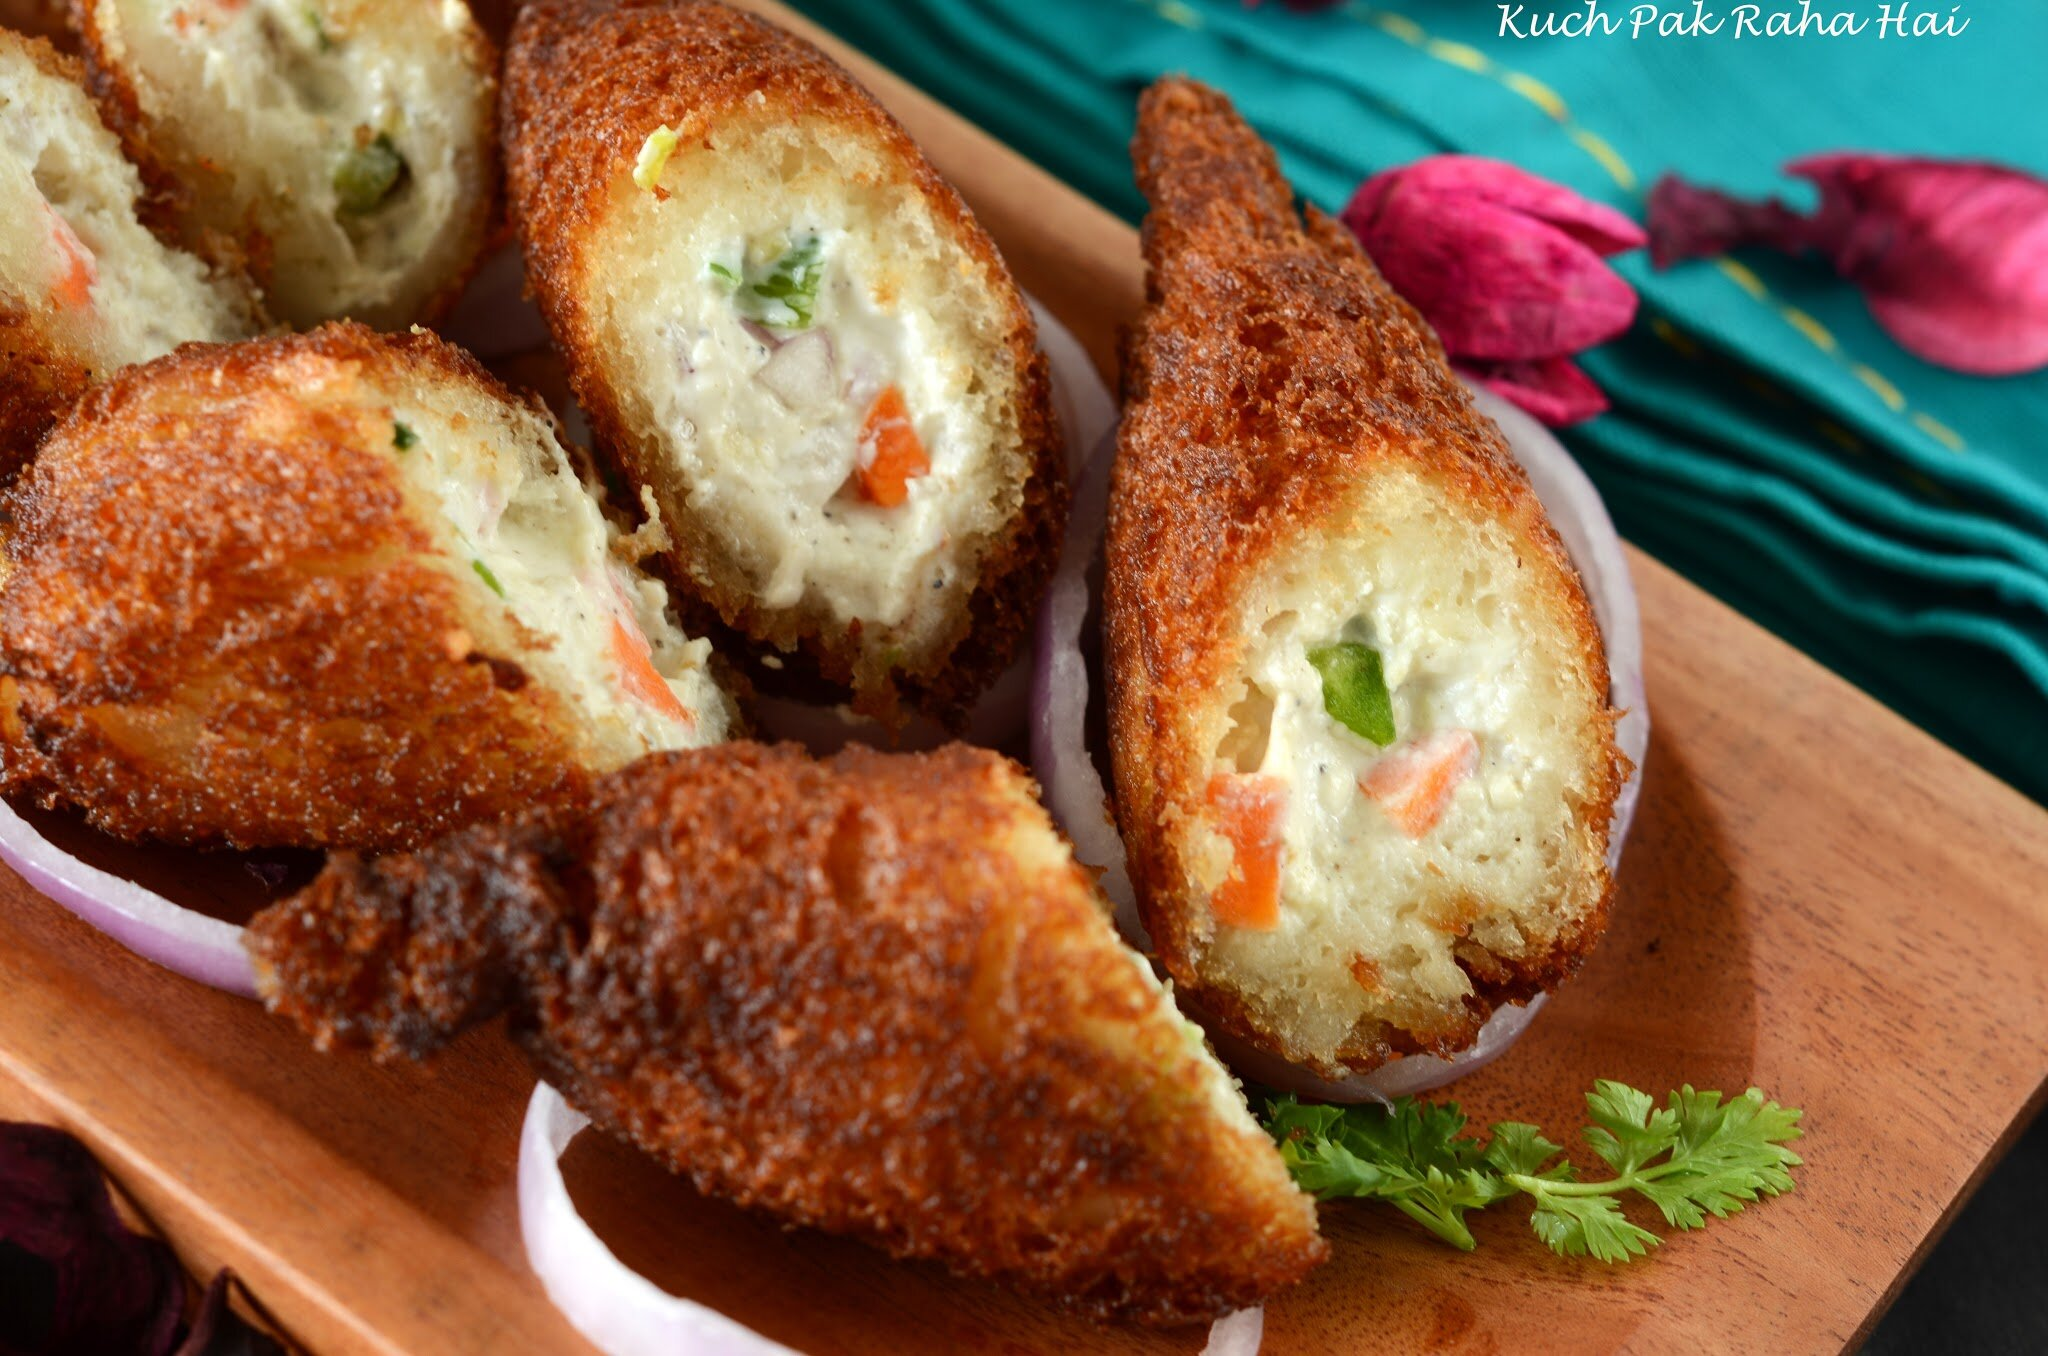 Dahi Ke Sholay Recipe (Bread Pockets stuffed with yoghurt)